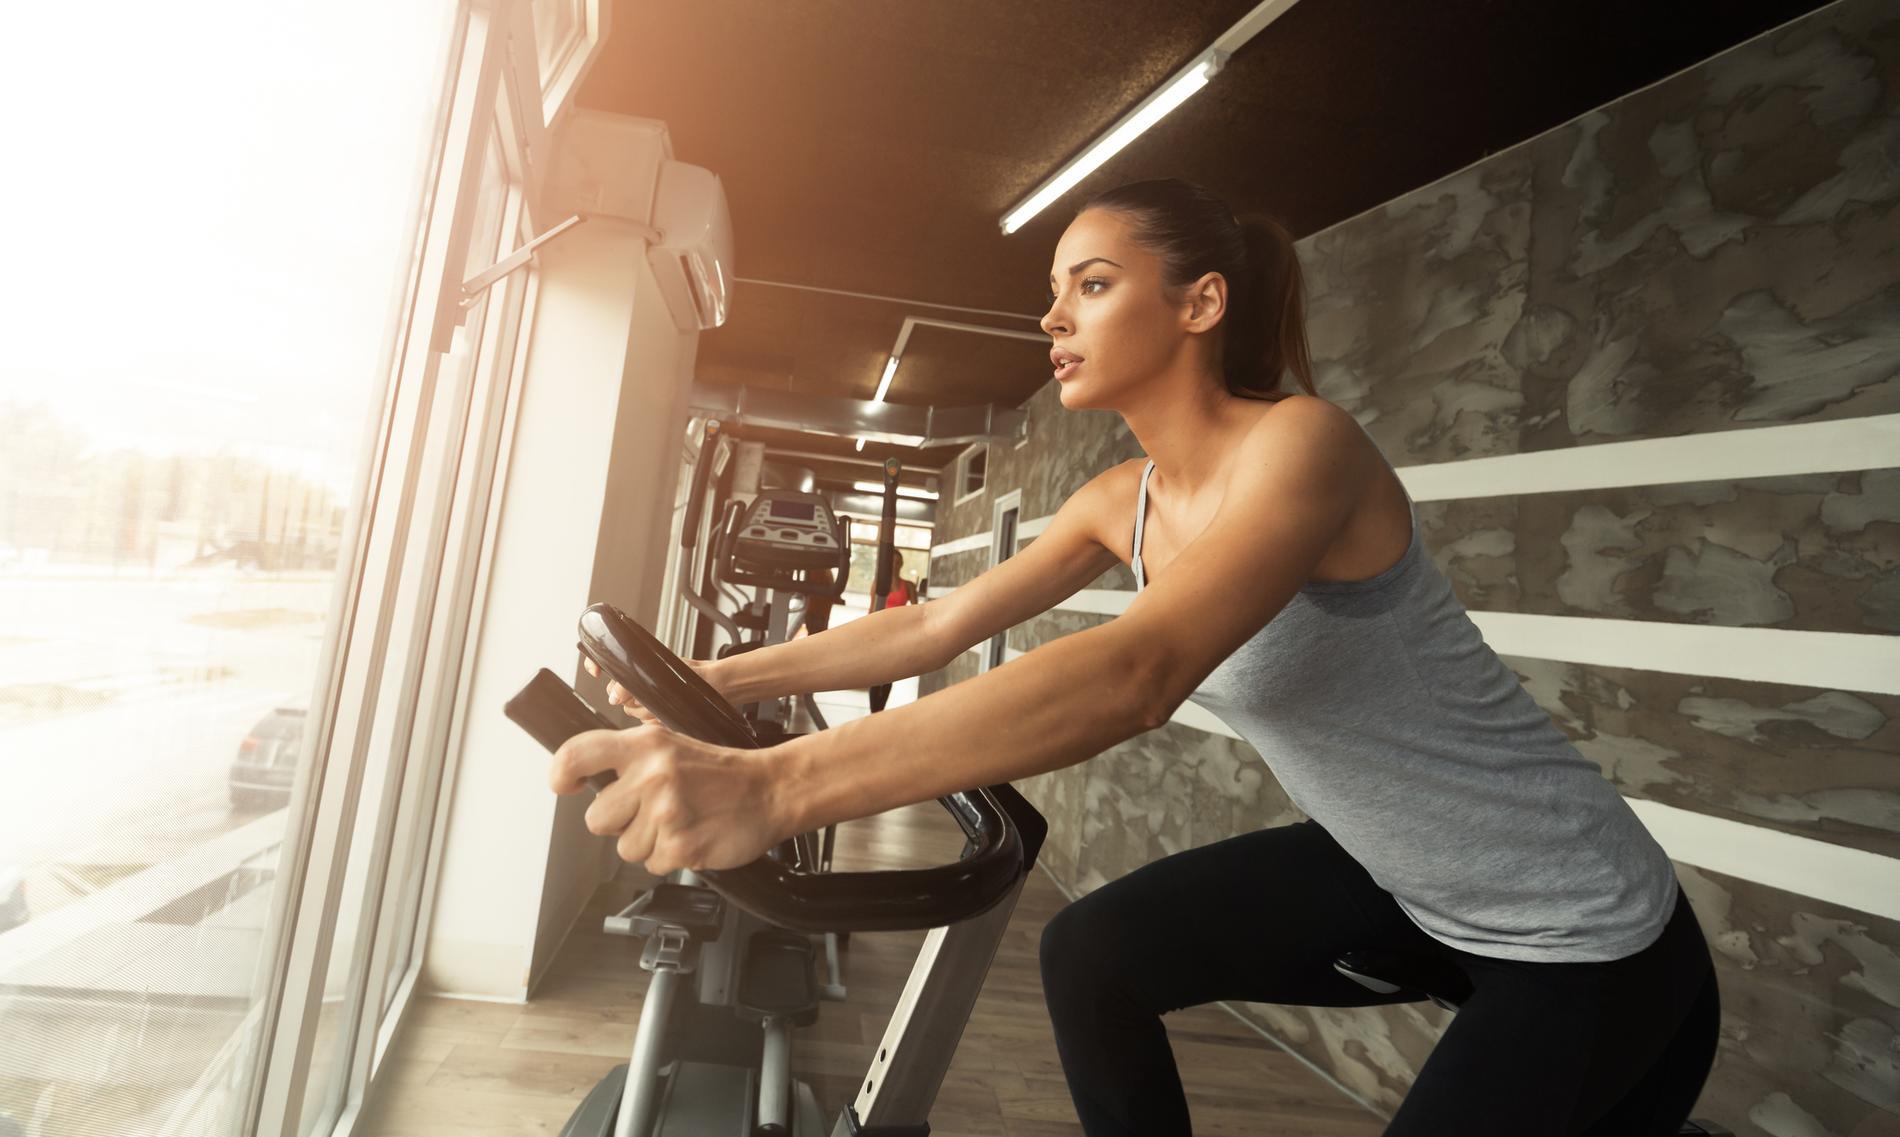 Prendre soin de son corps avec le cardio-training